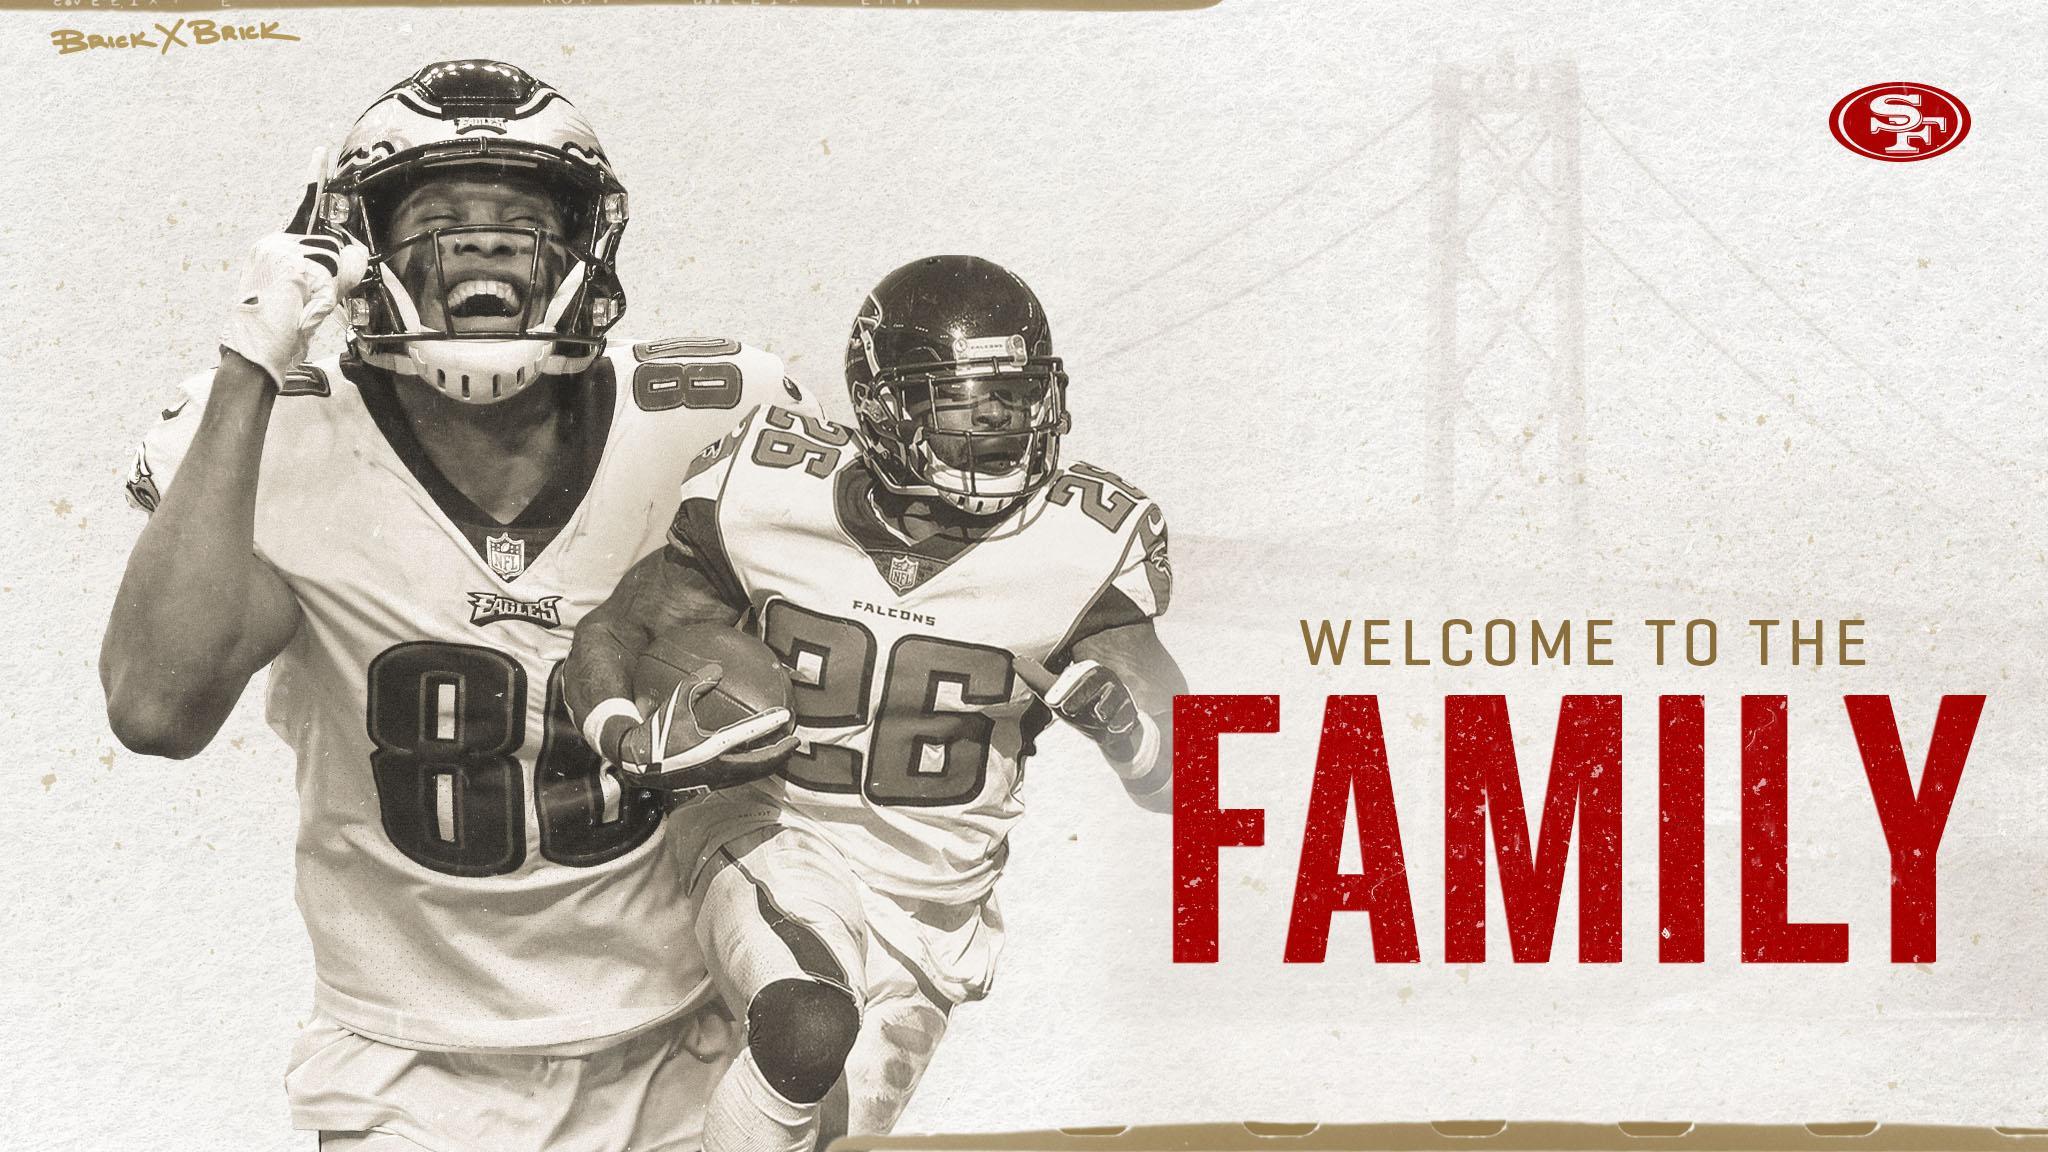 The #49ers have announced the signing of Tevin Coleman and Jordan Matthews.  Details: https://t.co/6LI3MFUMl4 https://t.co/jneLeu1Z7G